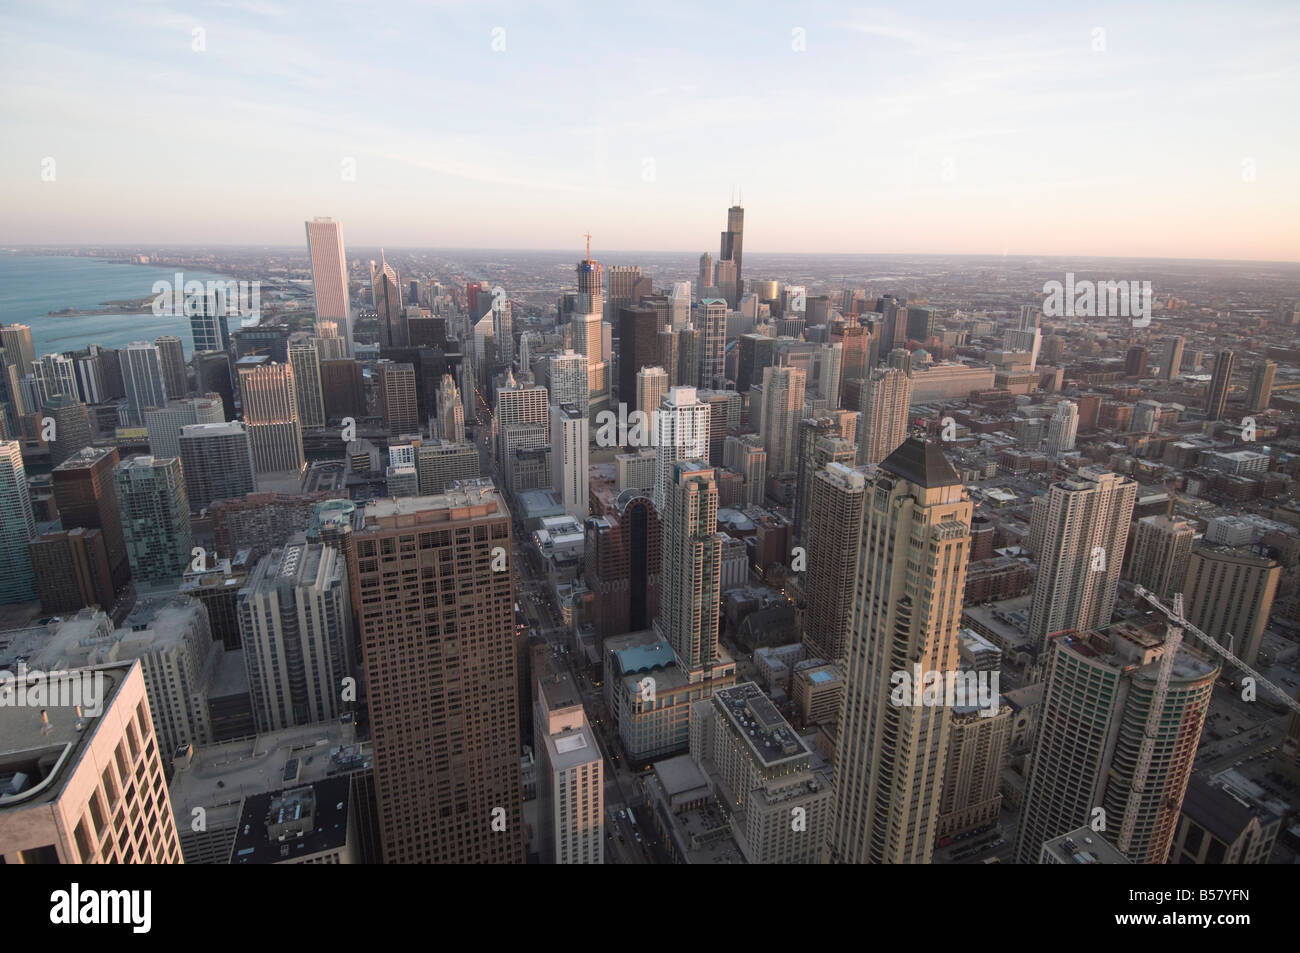 Chicago al atardecer tomada desde el edificio Hancock, Chicago, Illinois, Estados Unidos de América, América Imagen De Stock